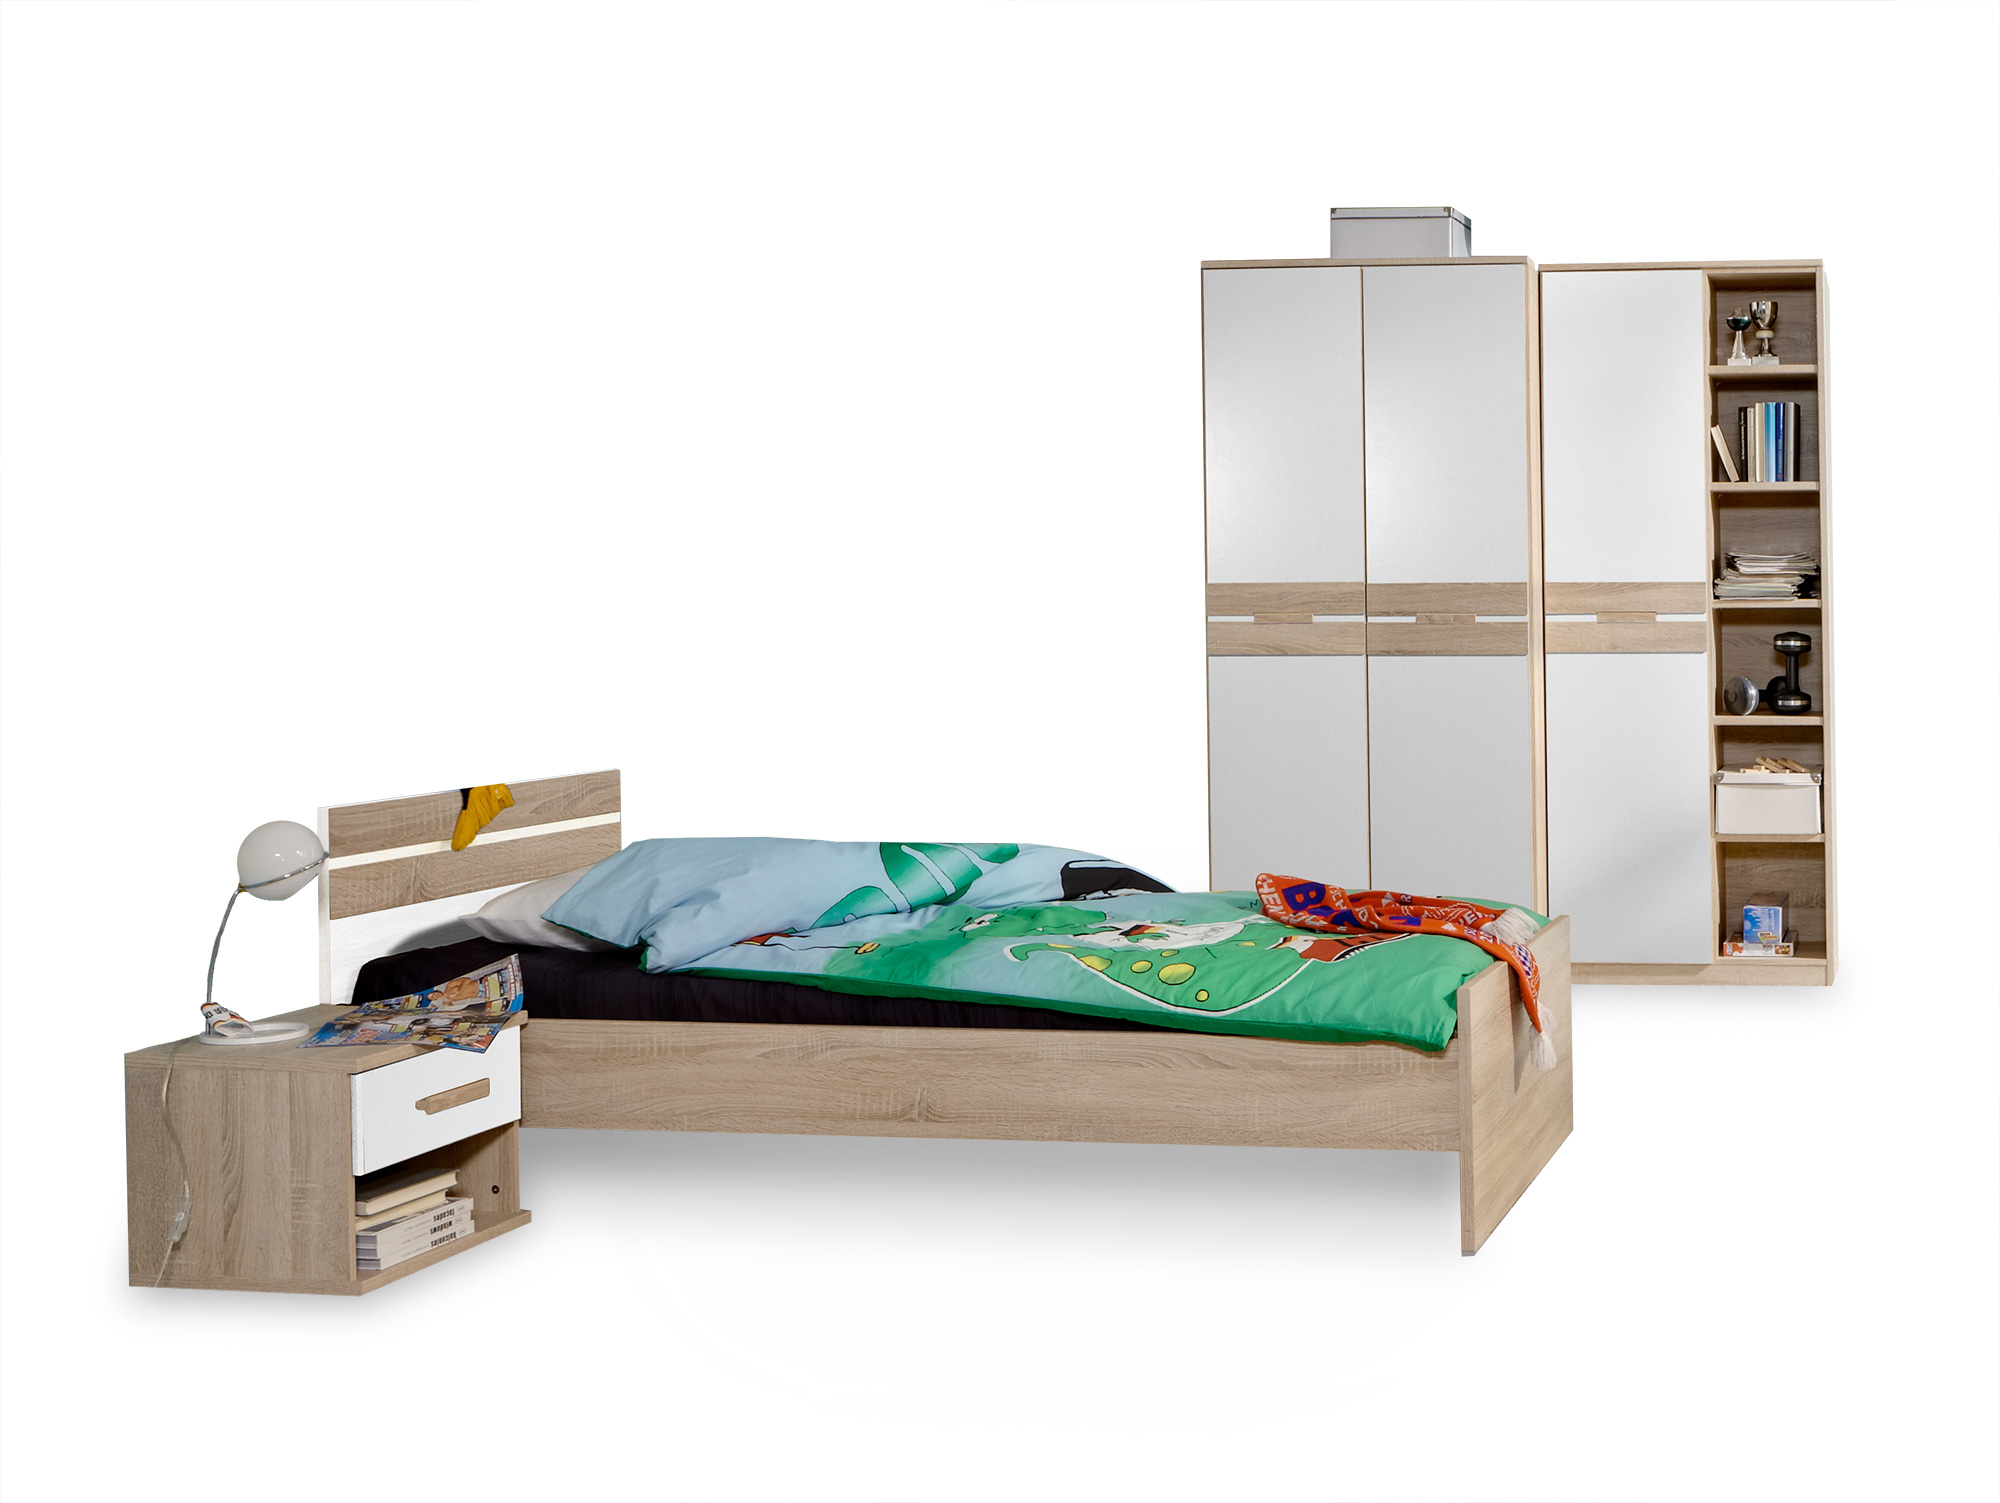 garry futonbett material dekorspanplatte 140x200 cm. Black Bedroom Furniture Sets. Home Design Ideas